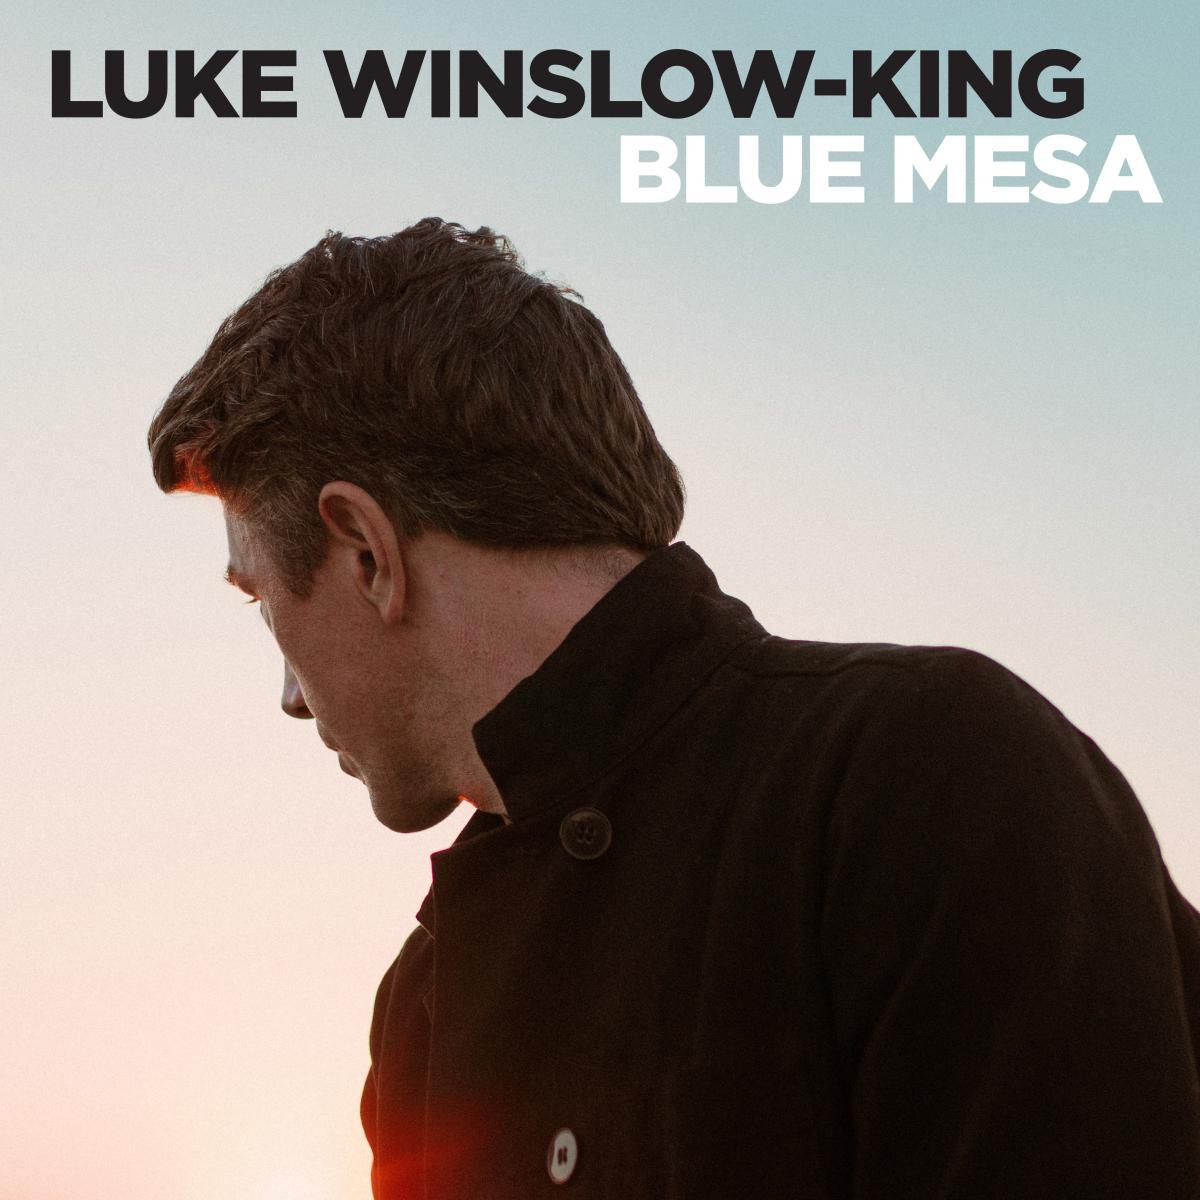 Blue Mesa Album Cover